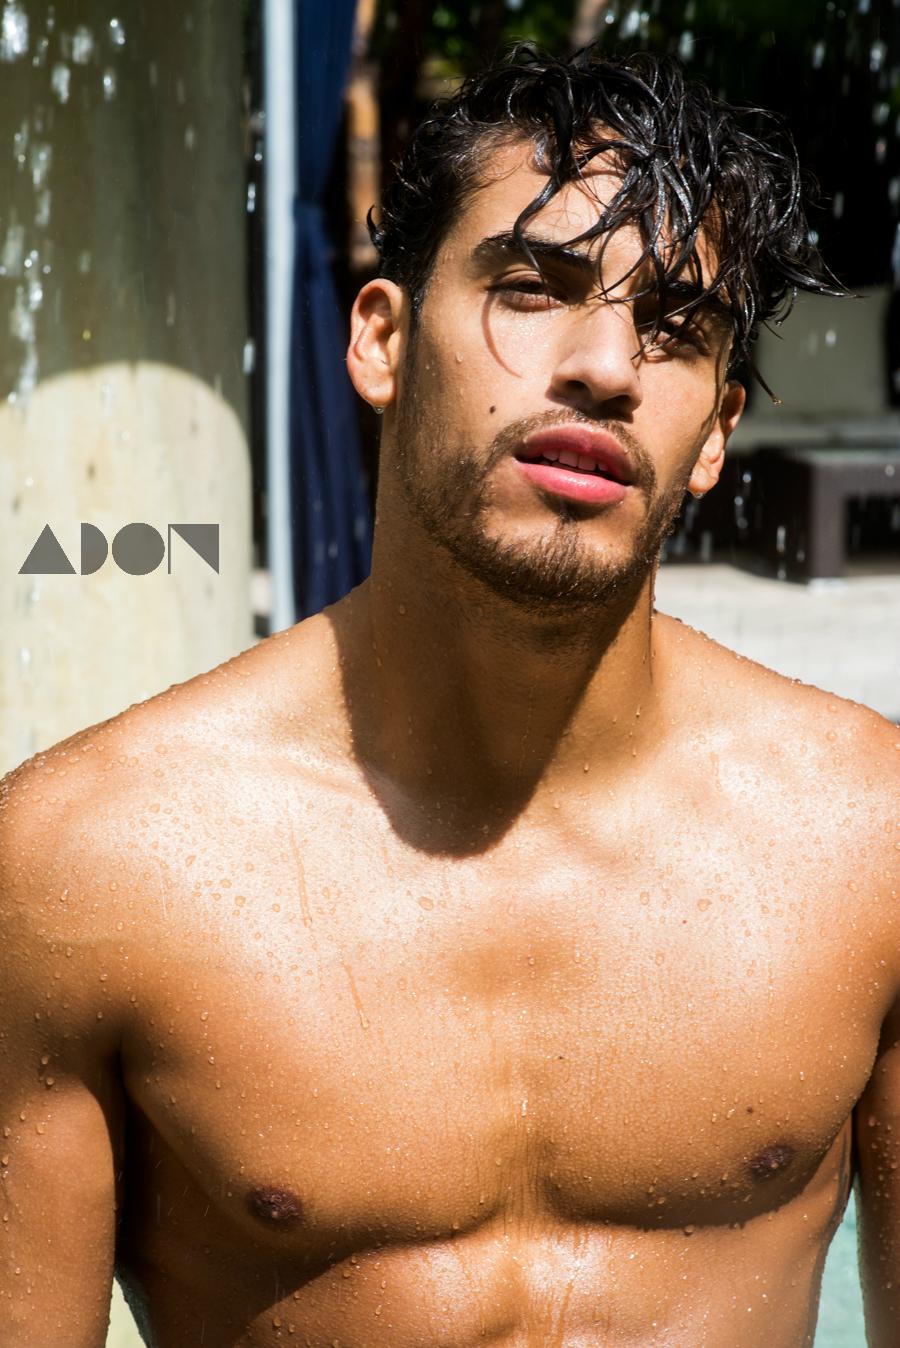 Adon Exclusive: Model Jon Durand By Frank Louis